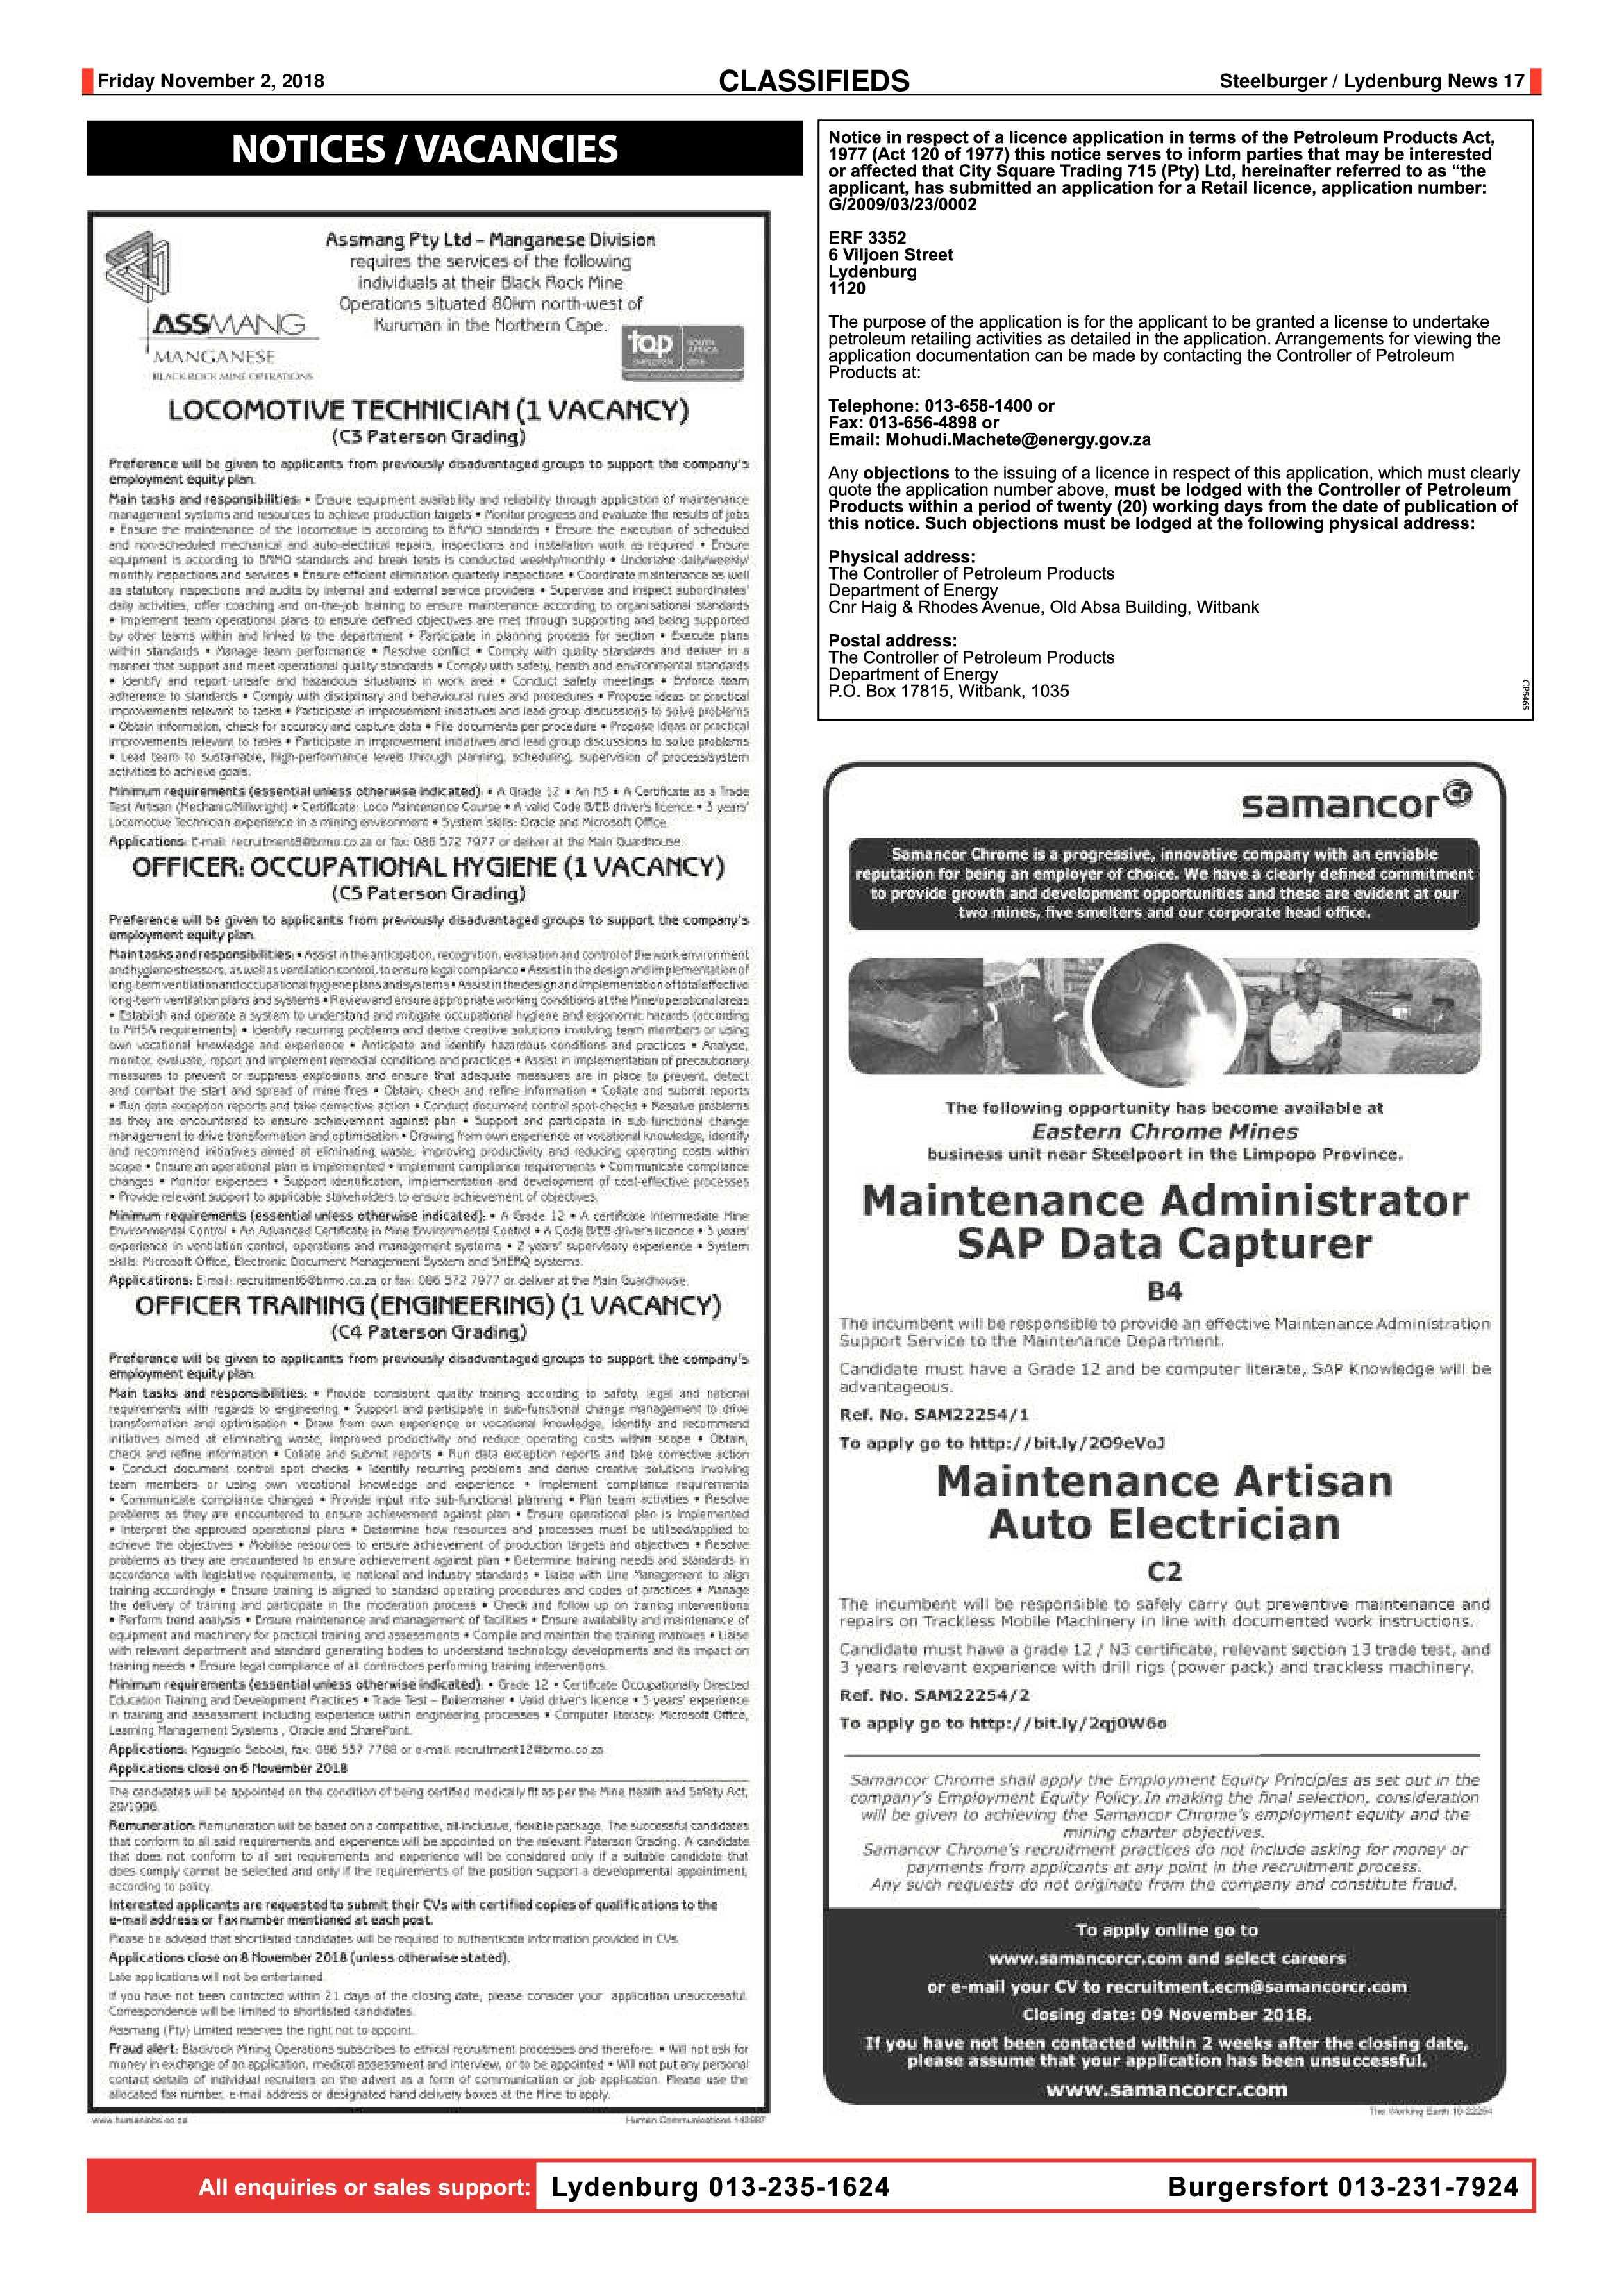 steelburger-news-2-november-2018-epapers-page-17